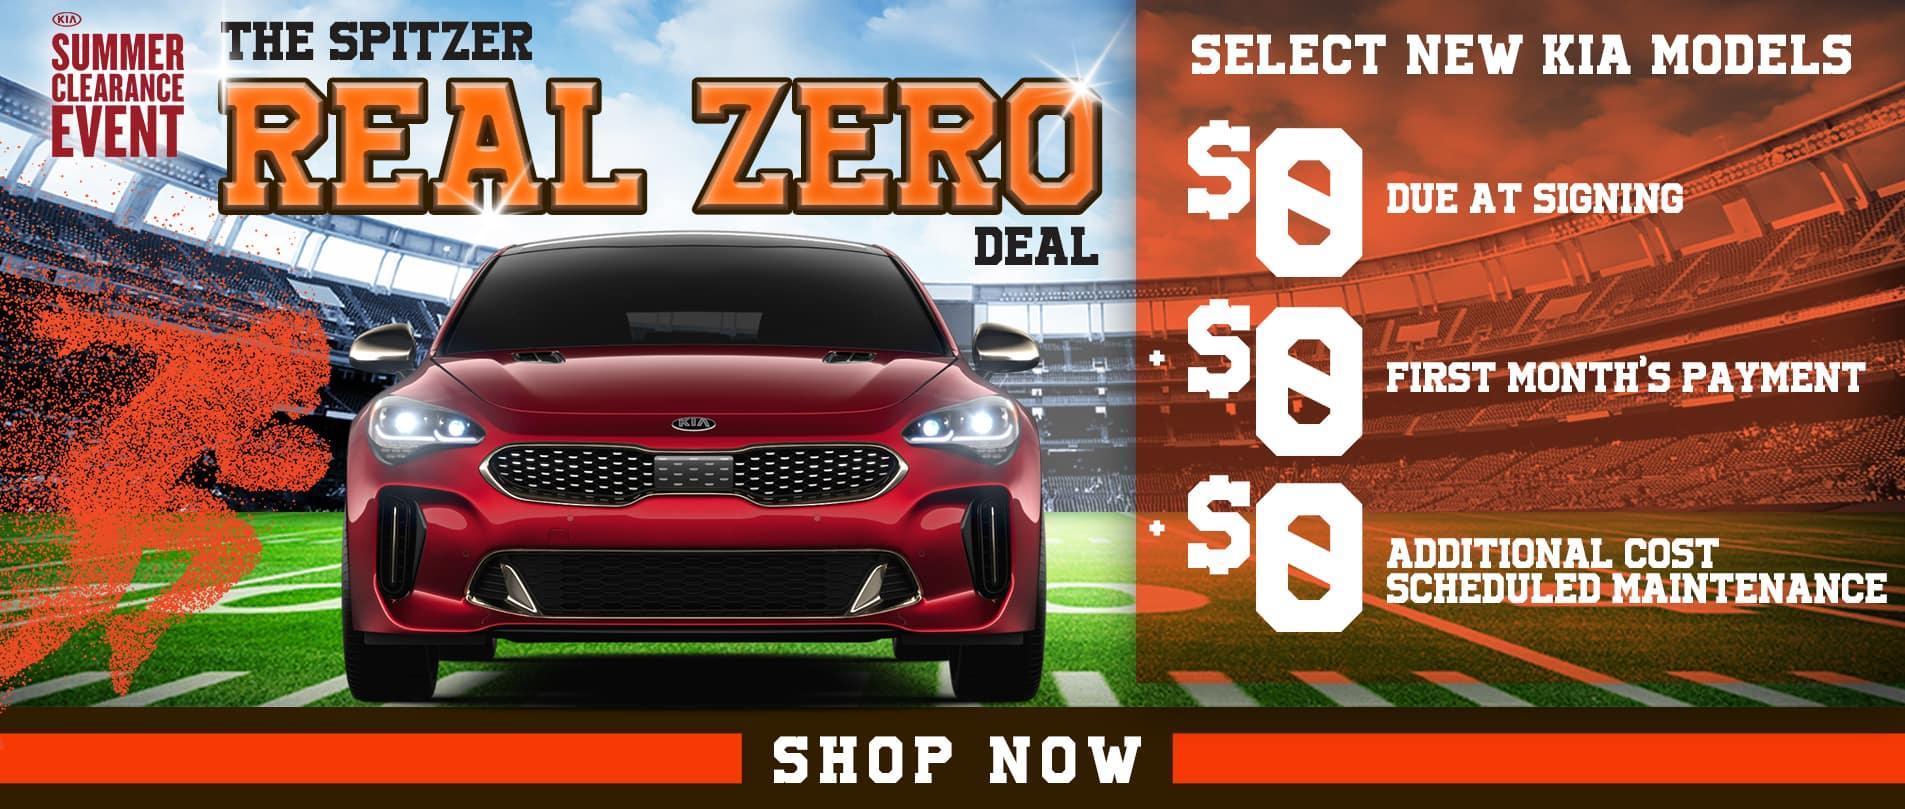 Spitzer Real Zero Deal